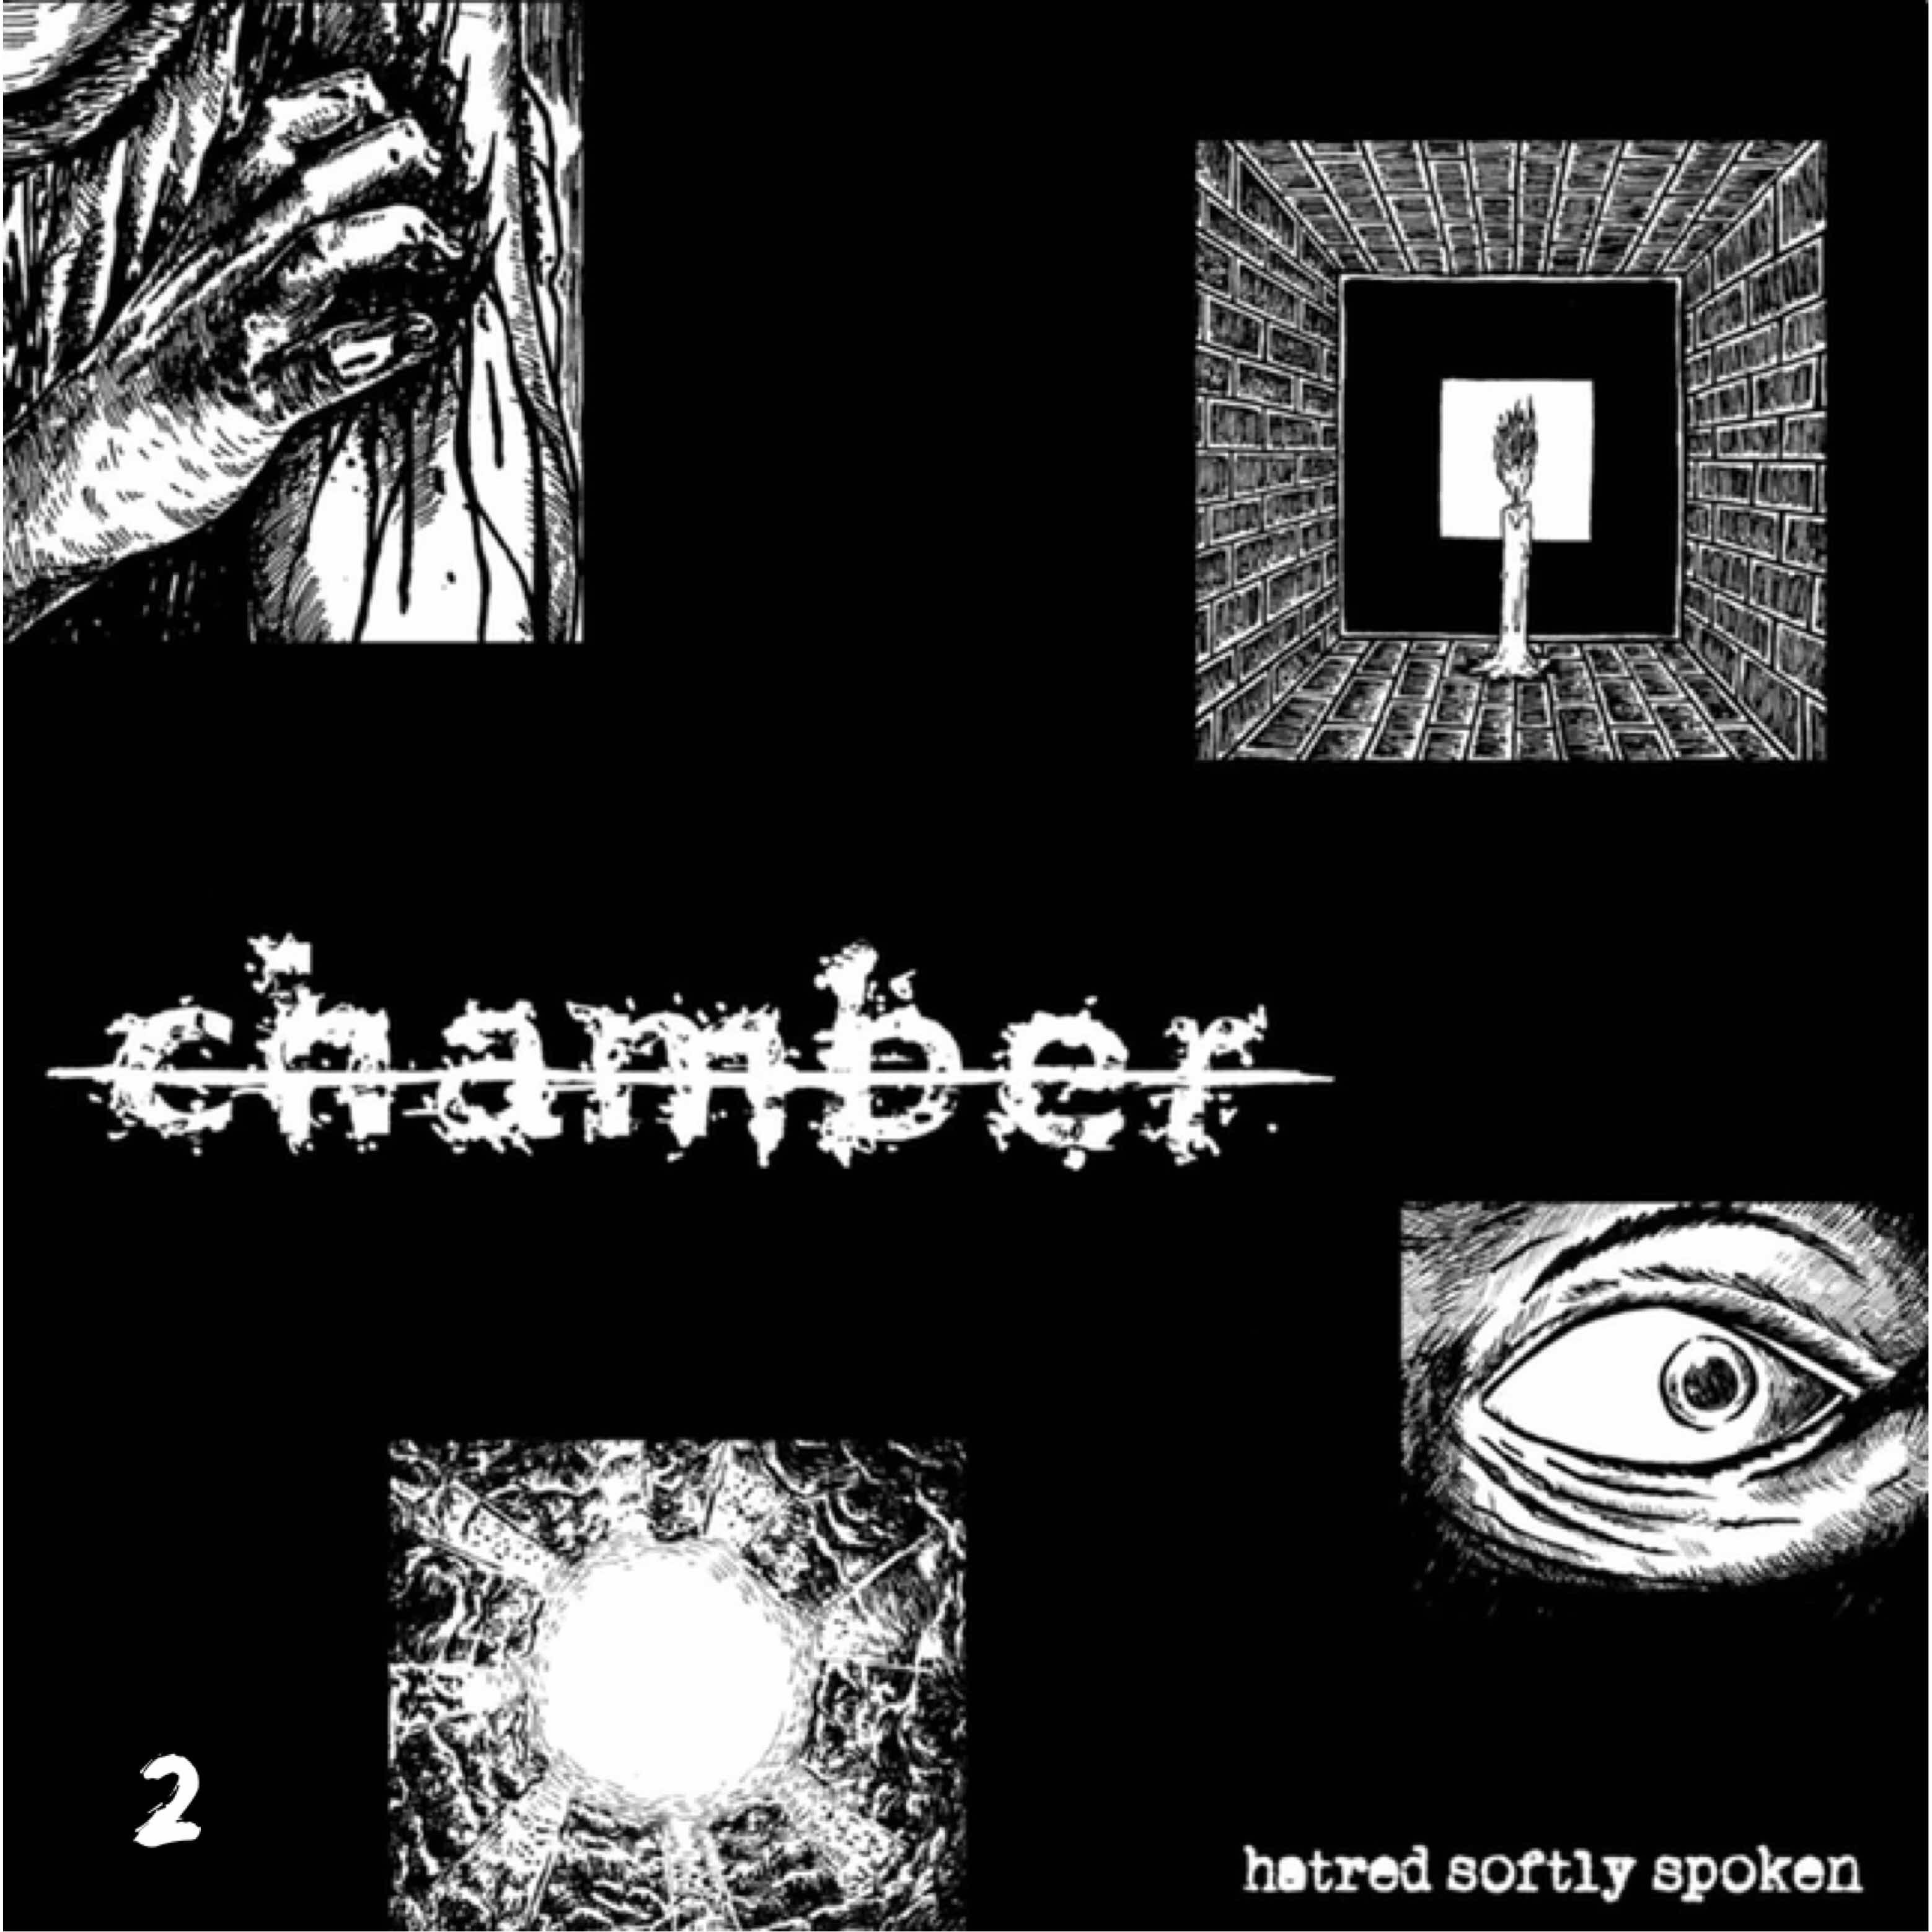 "Chamber ""Hatred Softly Spoken"""